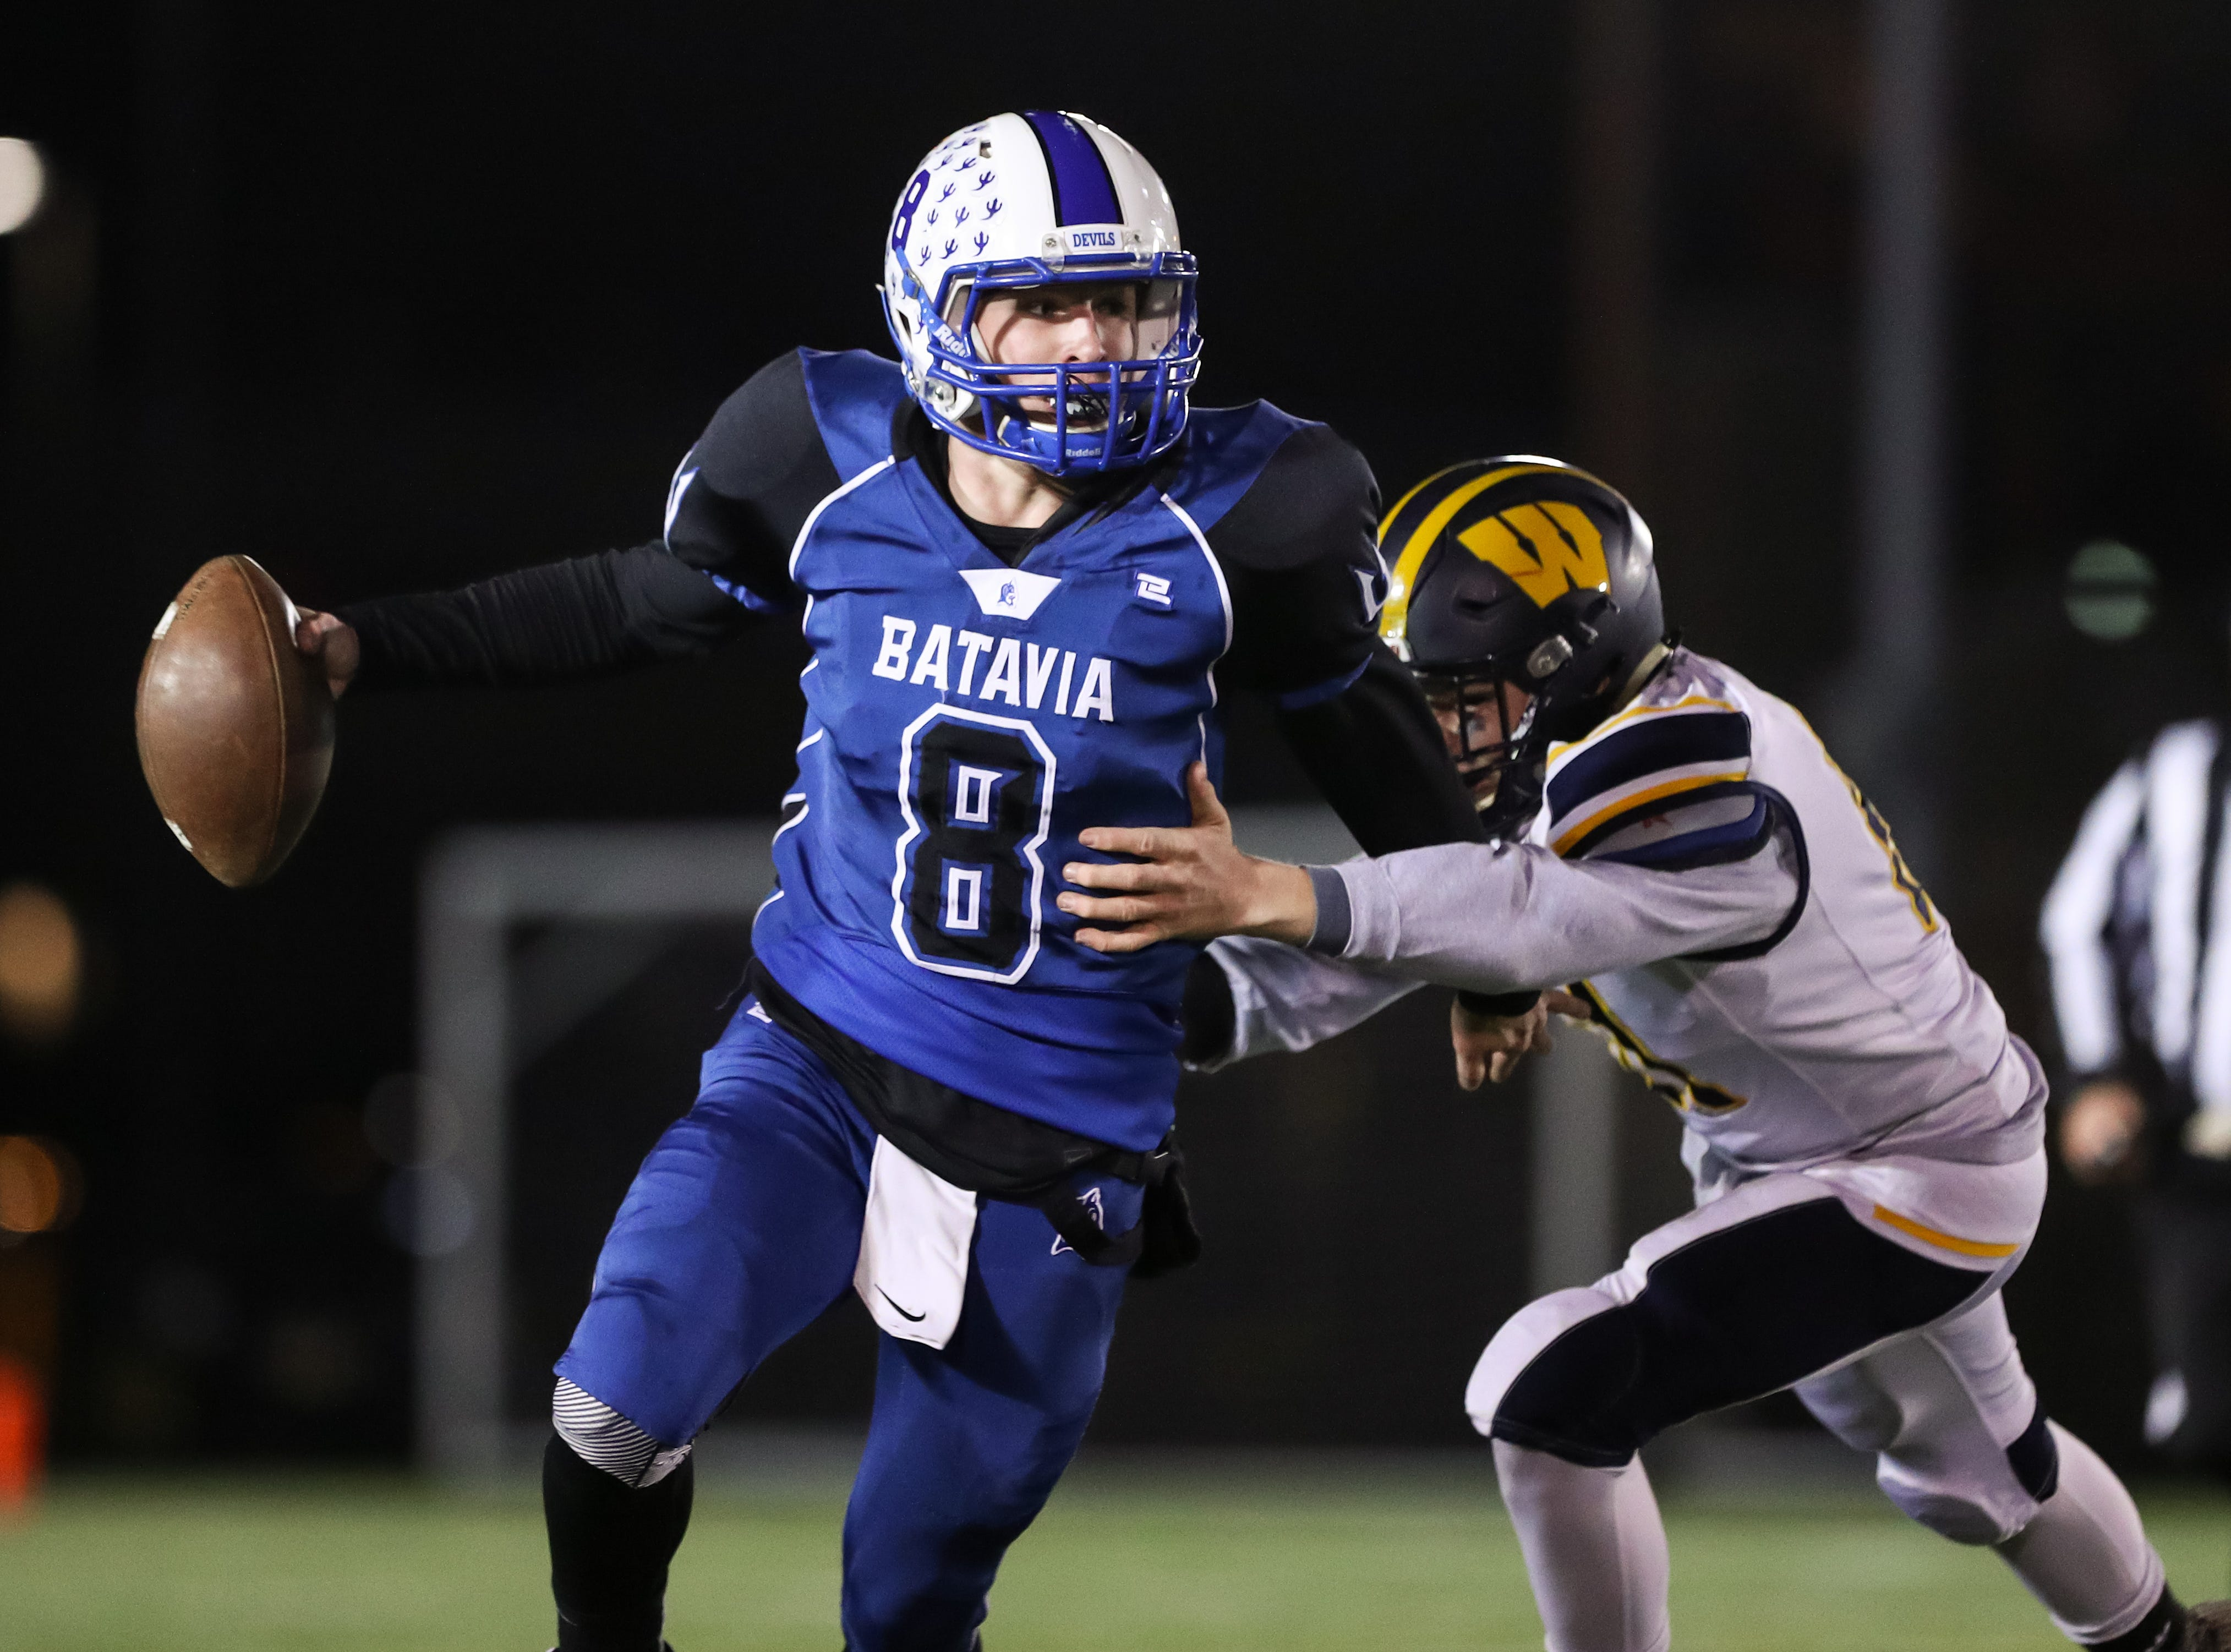 Batavia Blue Devils quarterback Ethan Biscaro avoids a pass rusher.